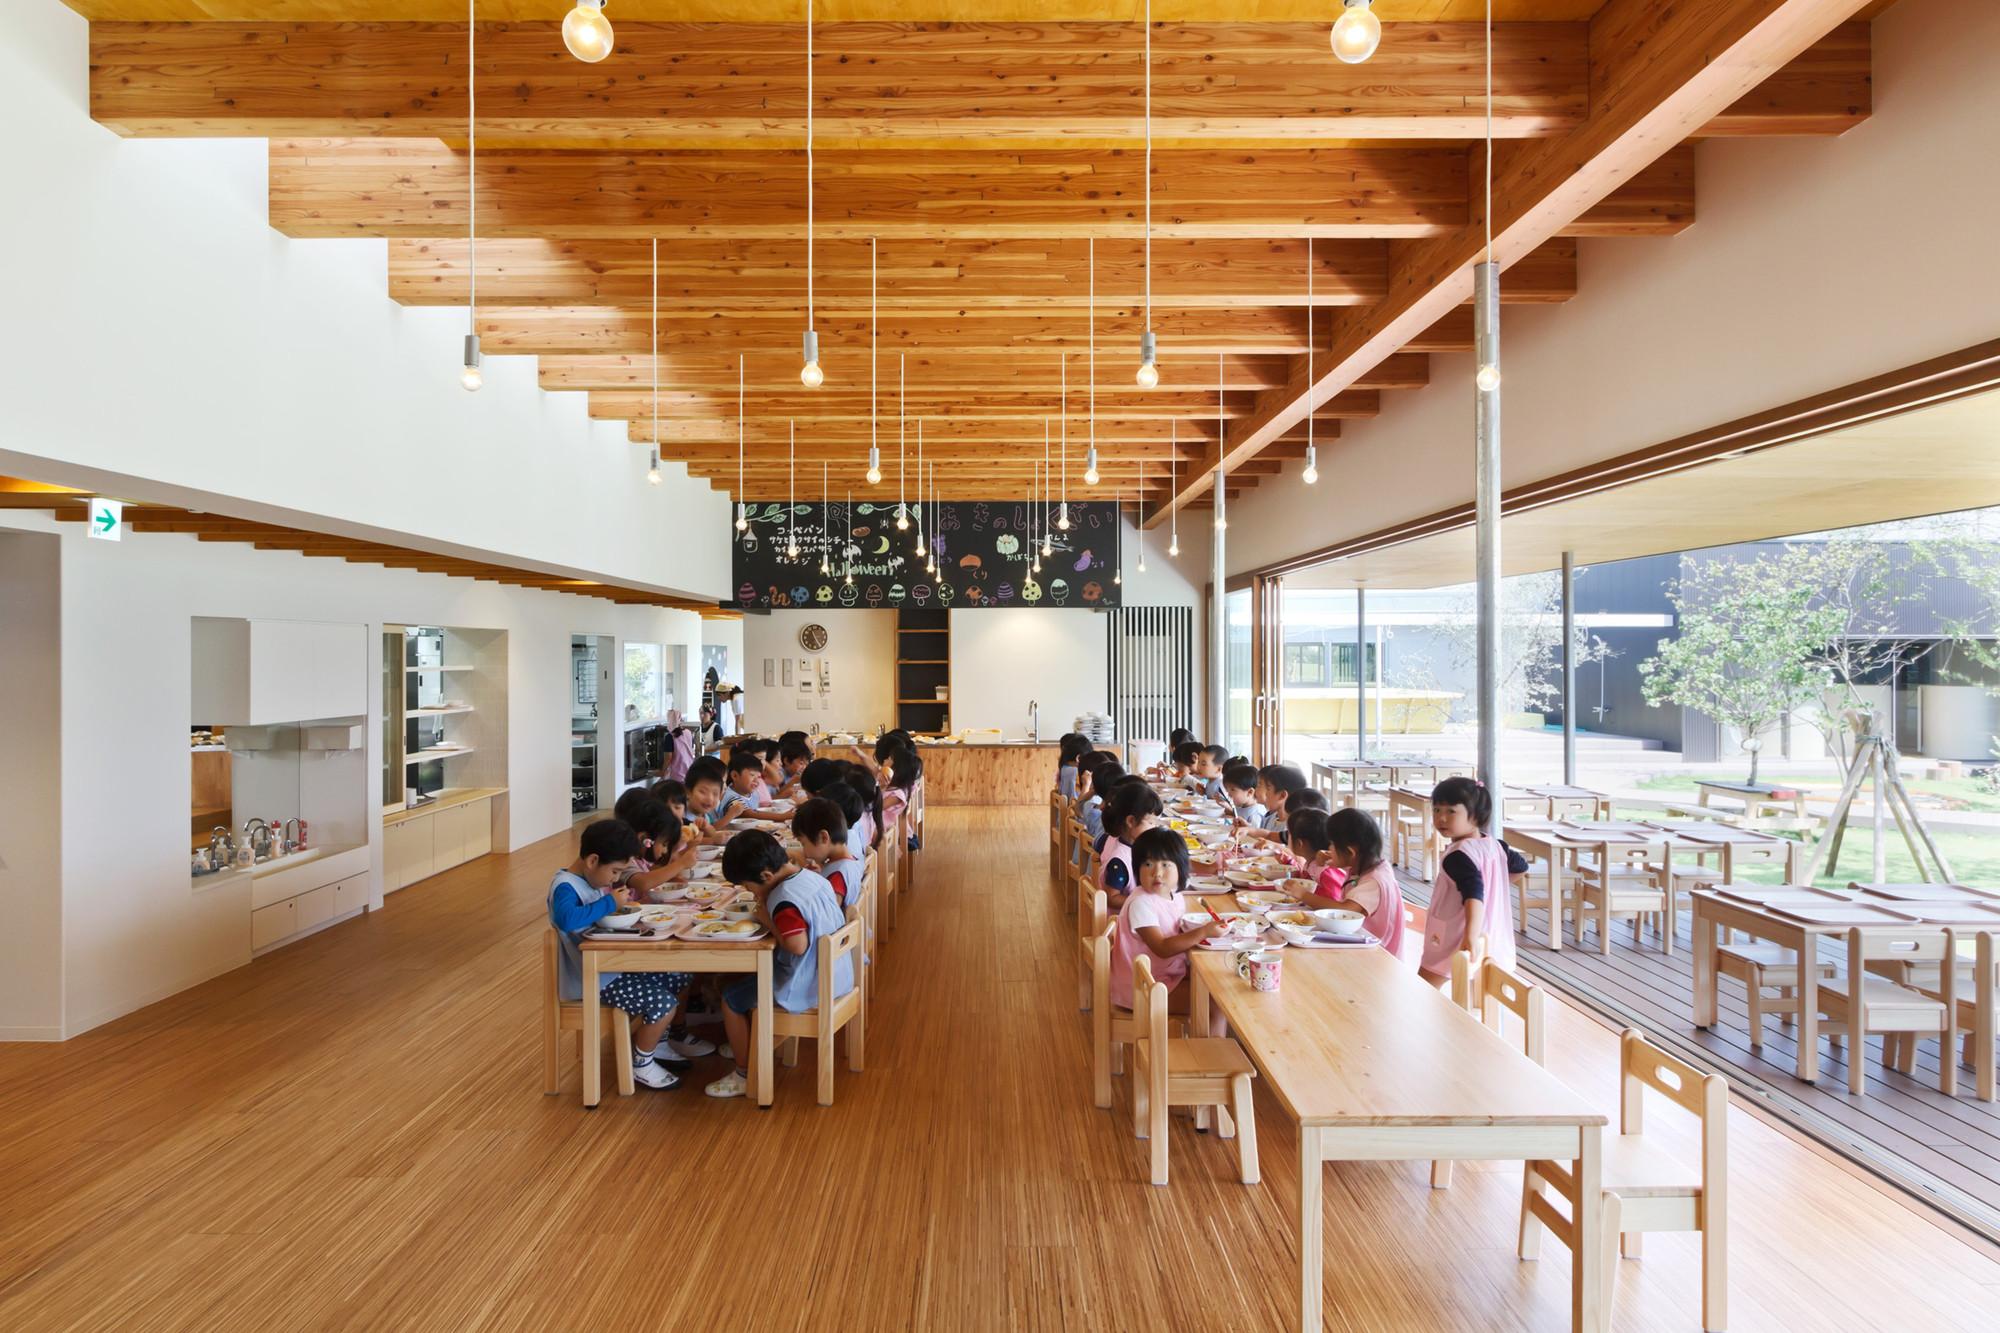 D S Nursery Hibinosekkei Youji No Shiro Studio Bauhaus